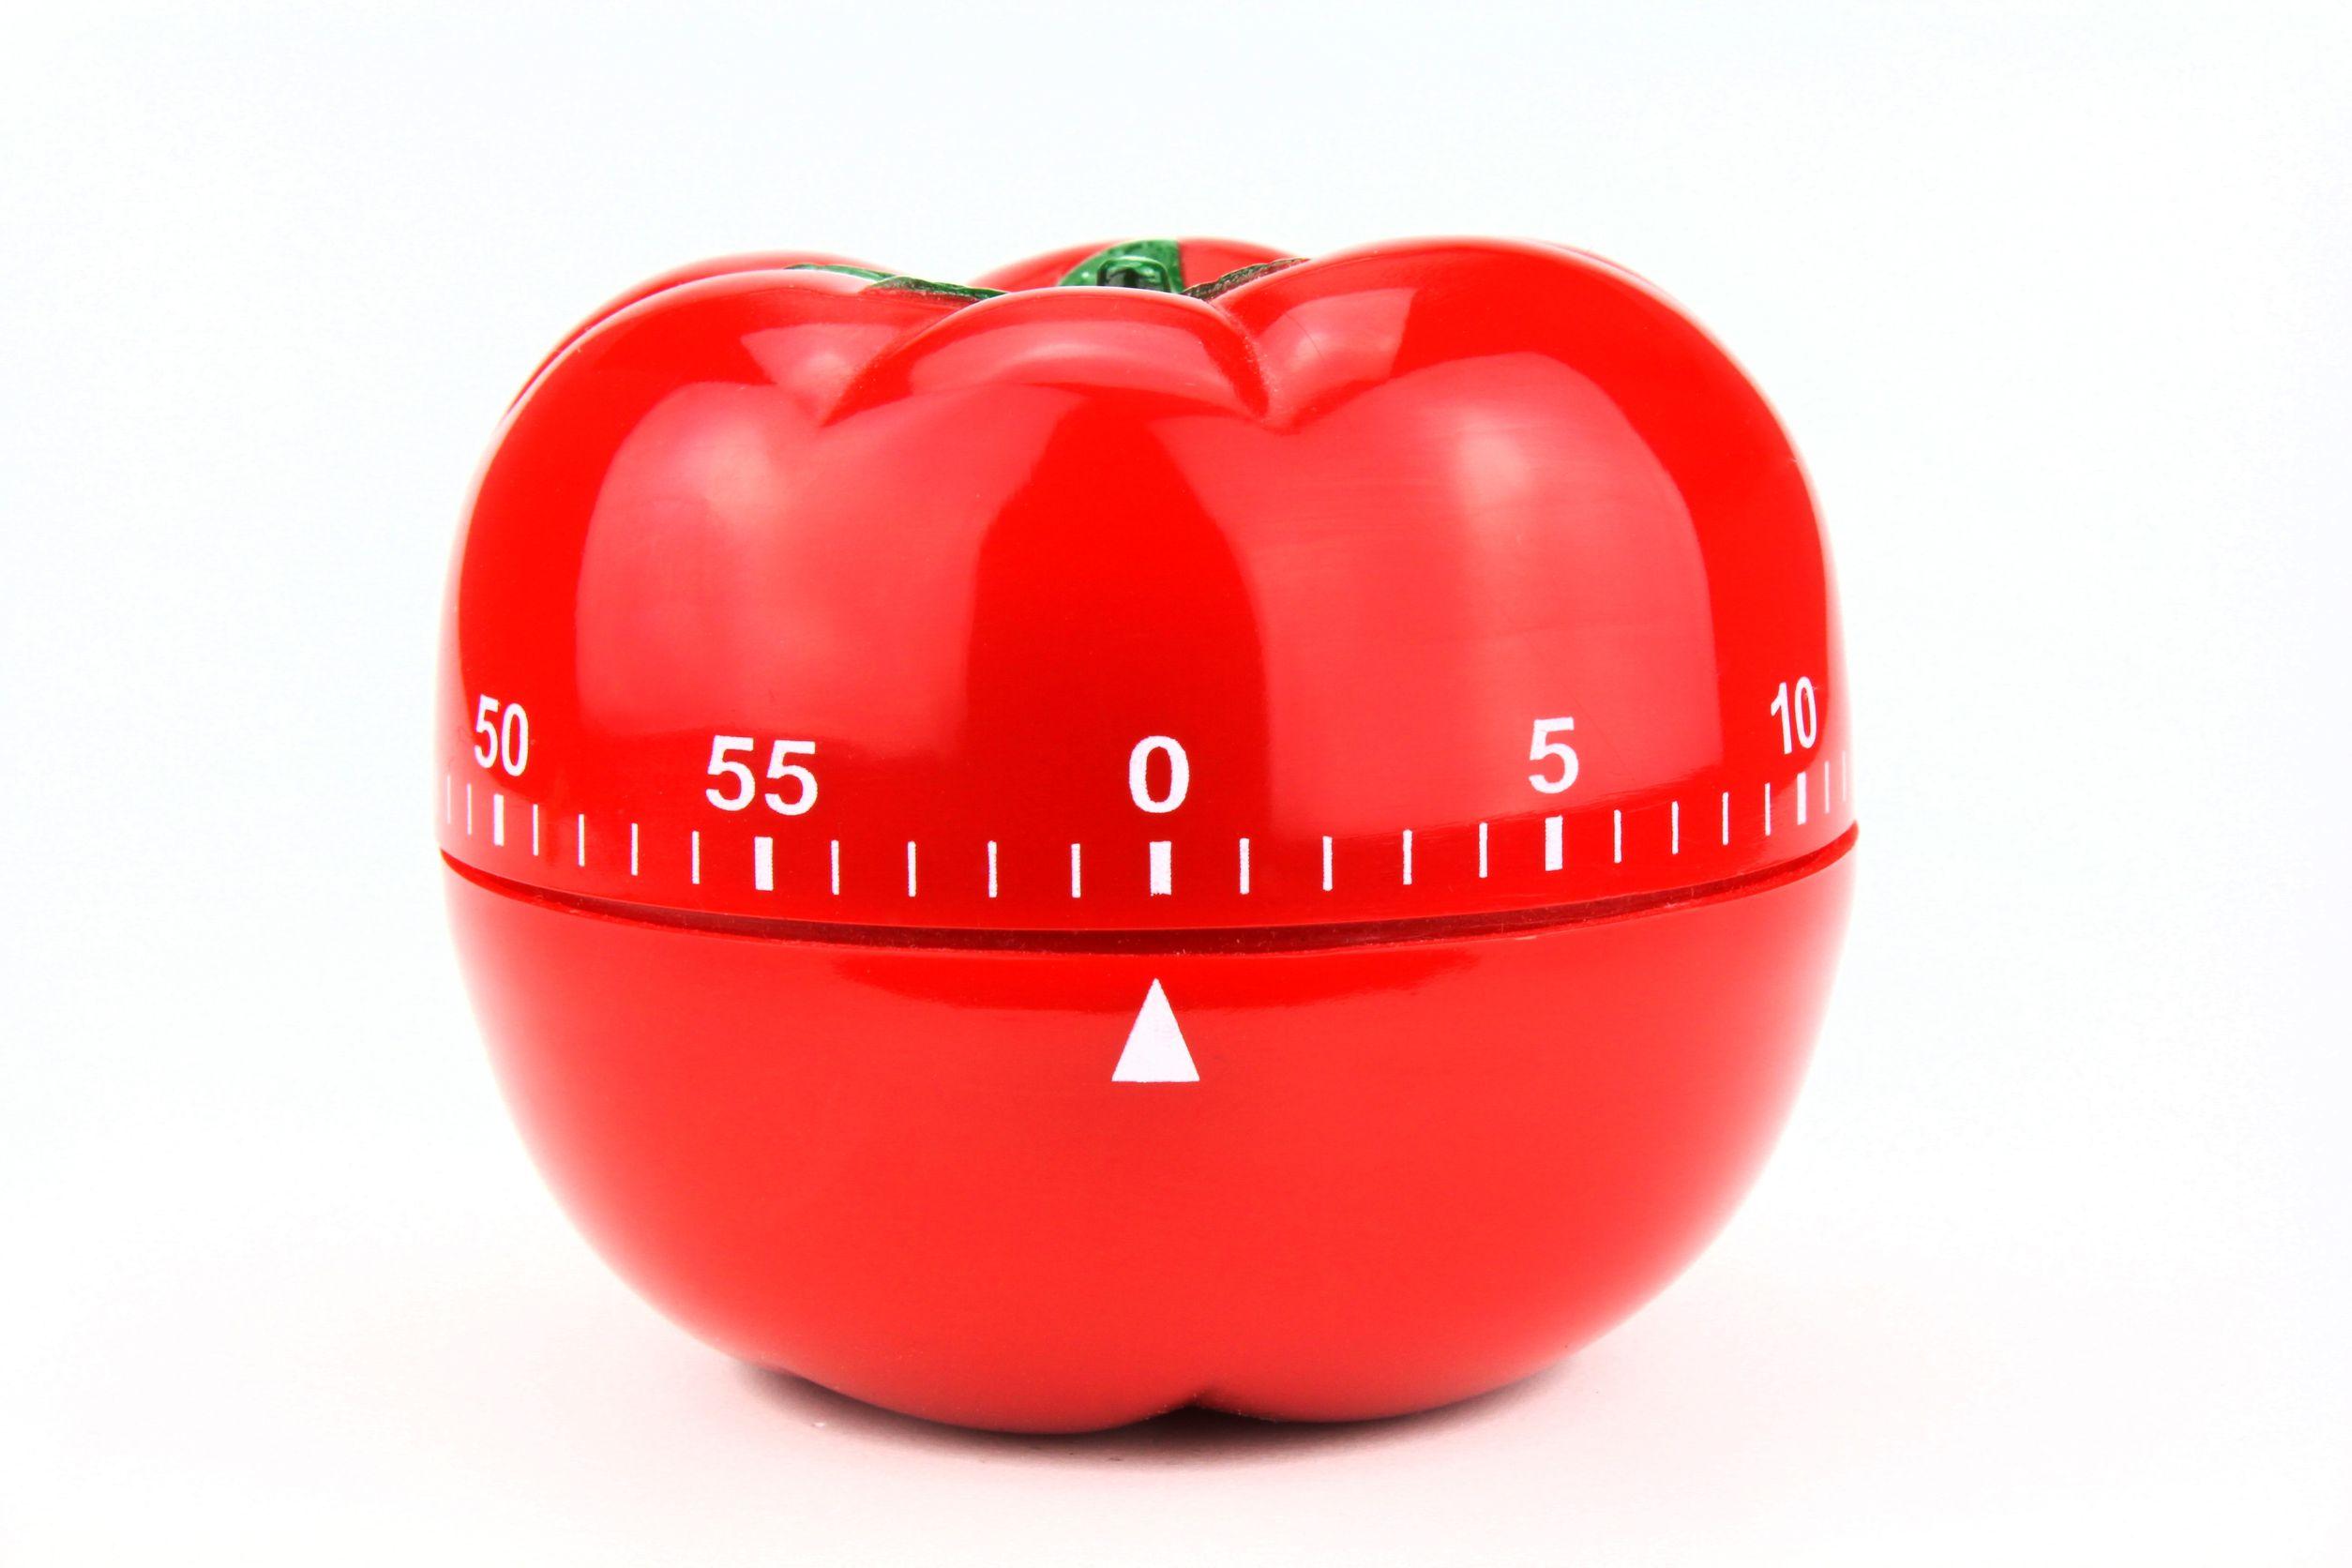 Pomodoro Timer Técnica